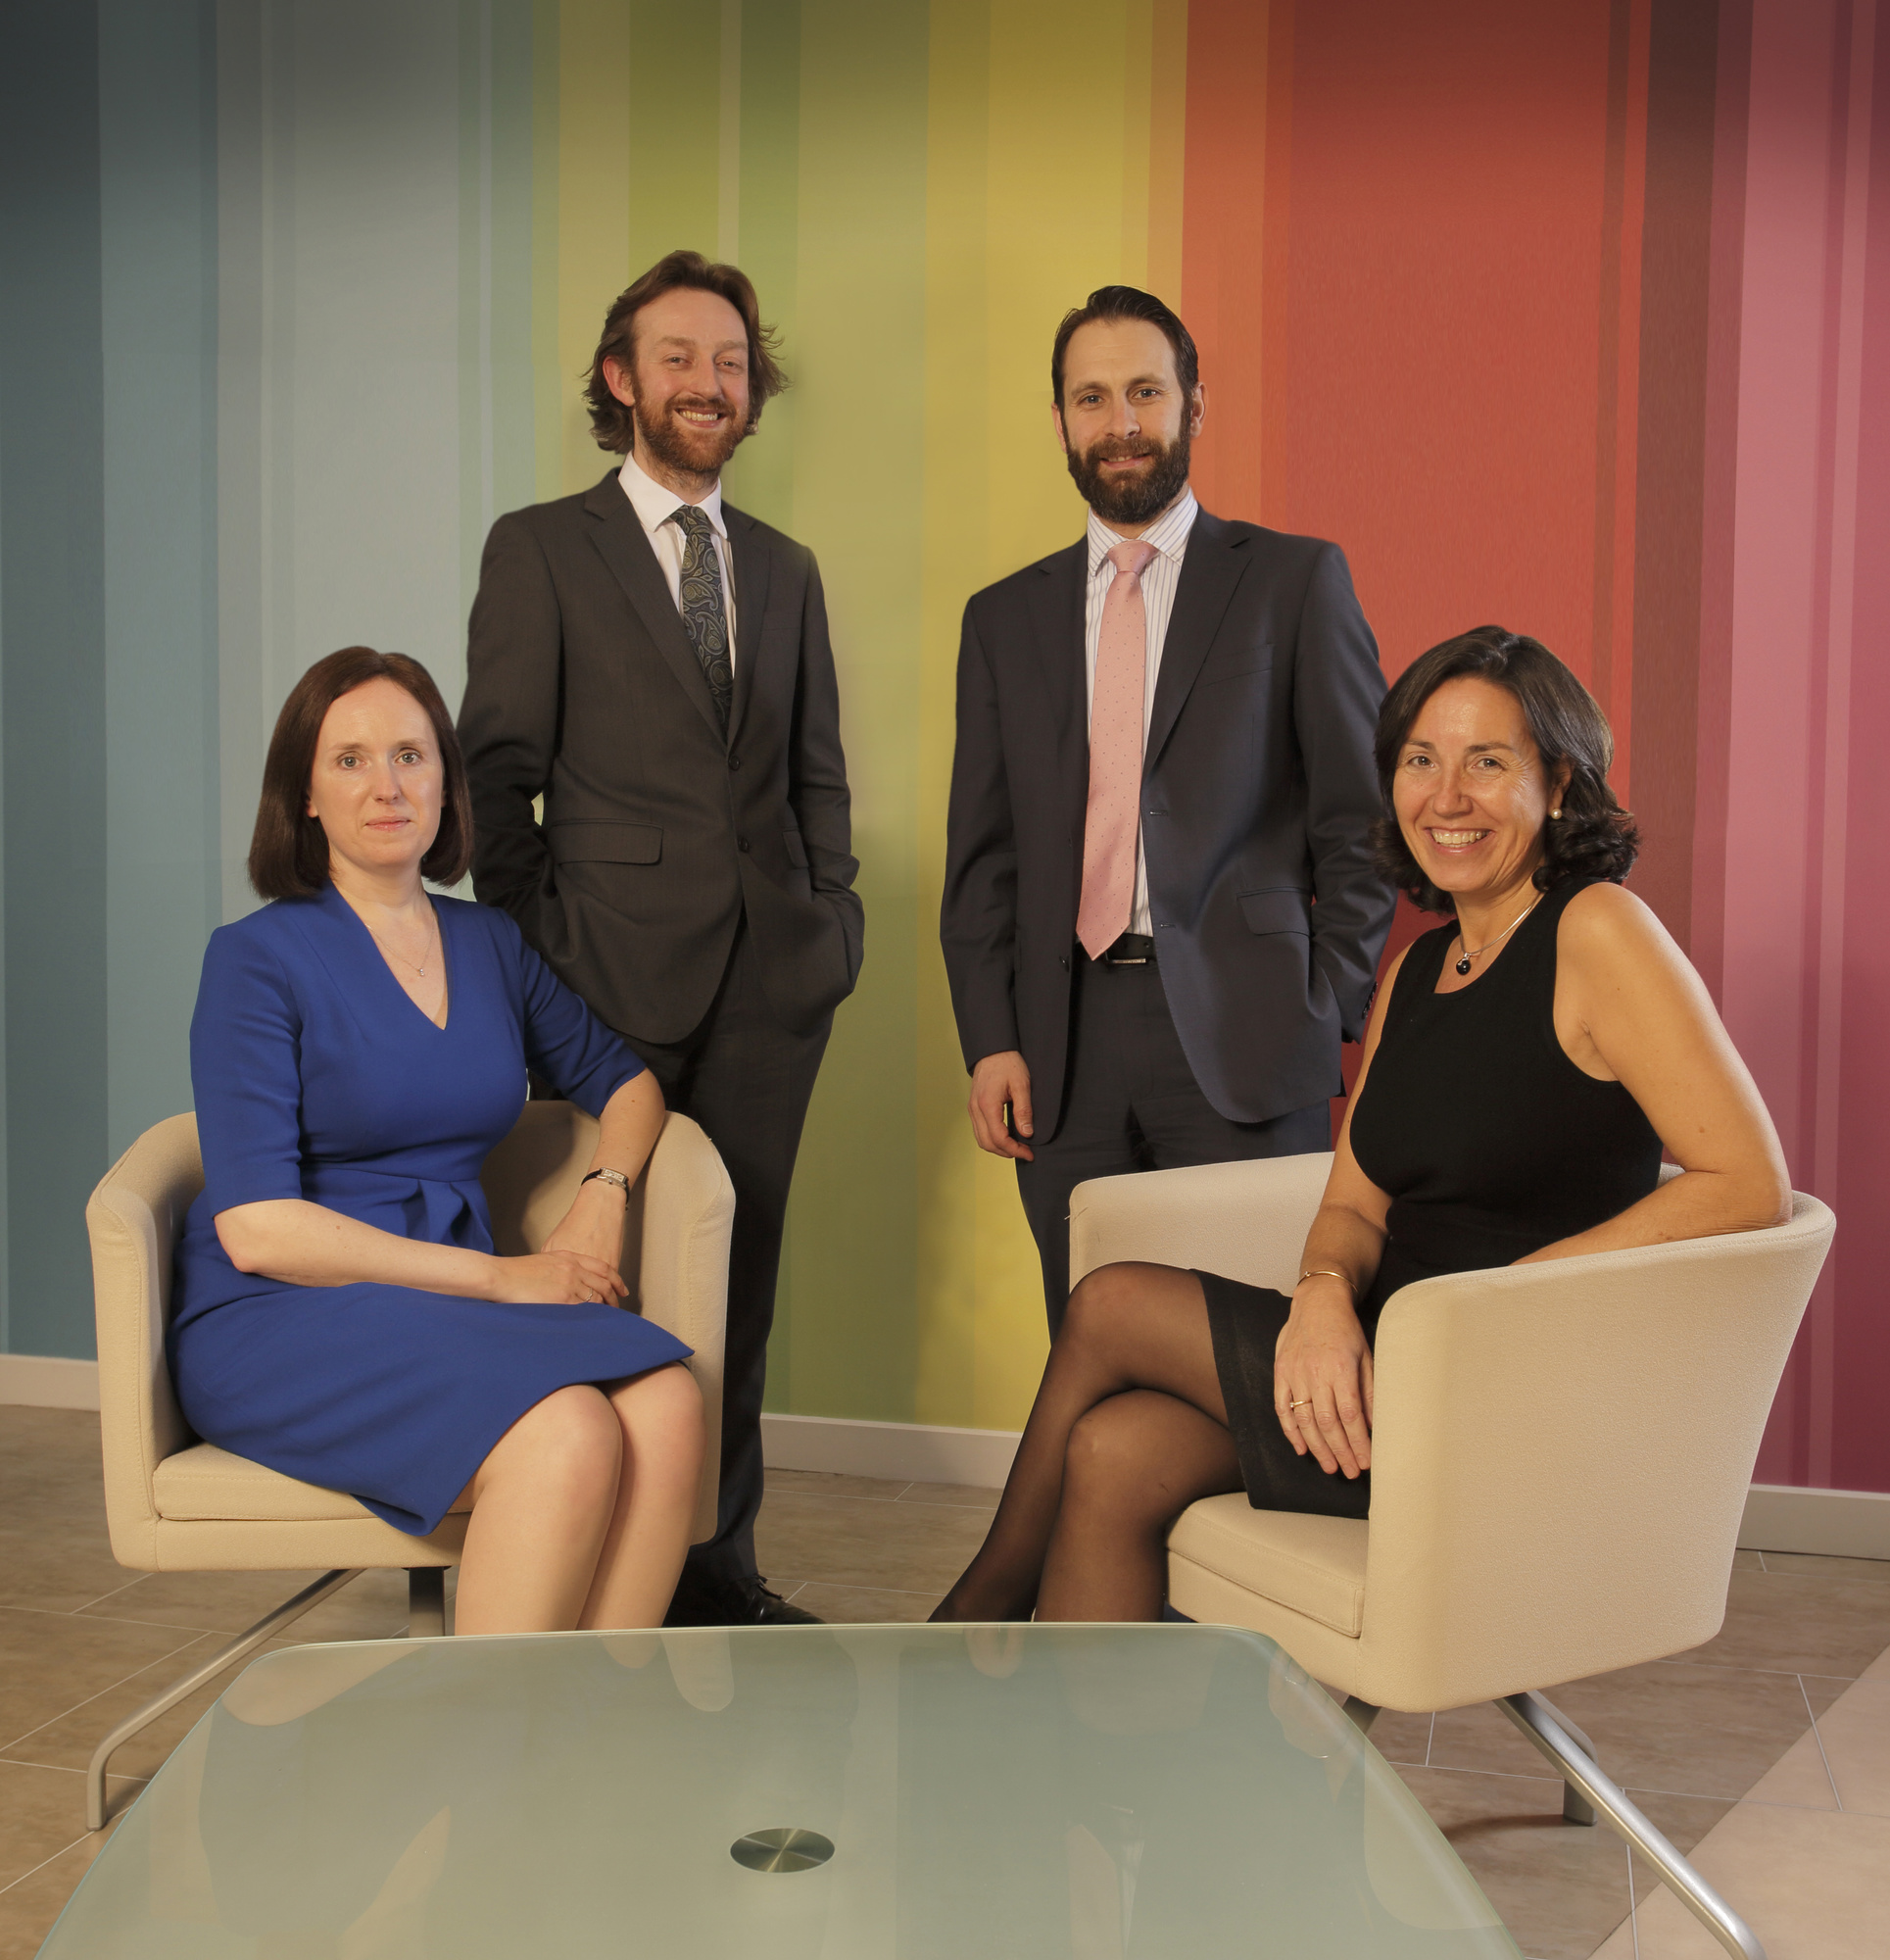 From left, Sarah Forster, John Hays, Philip Clare and Marta Fernandez Varona